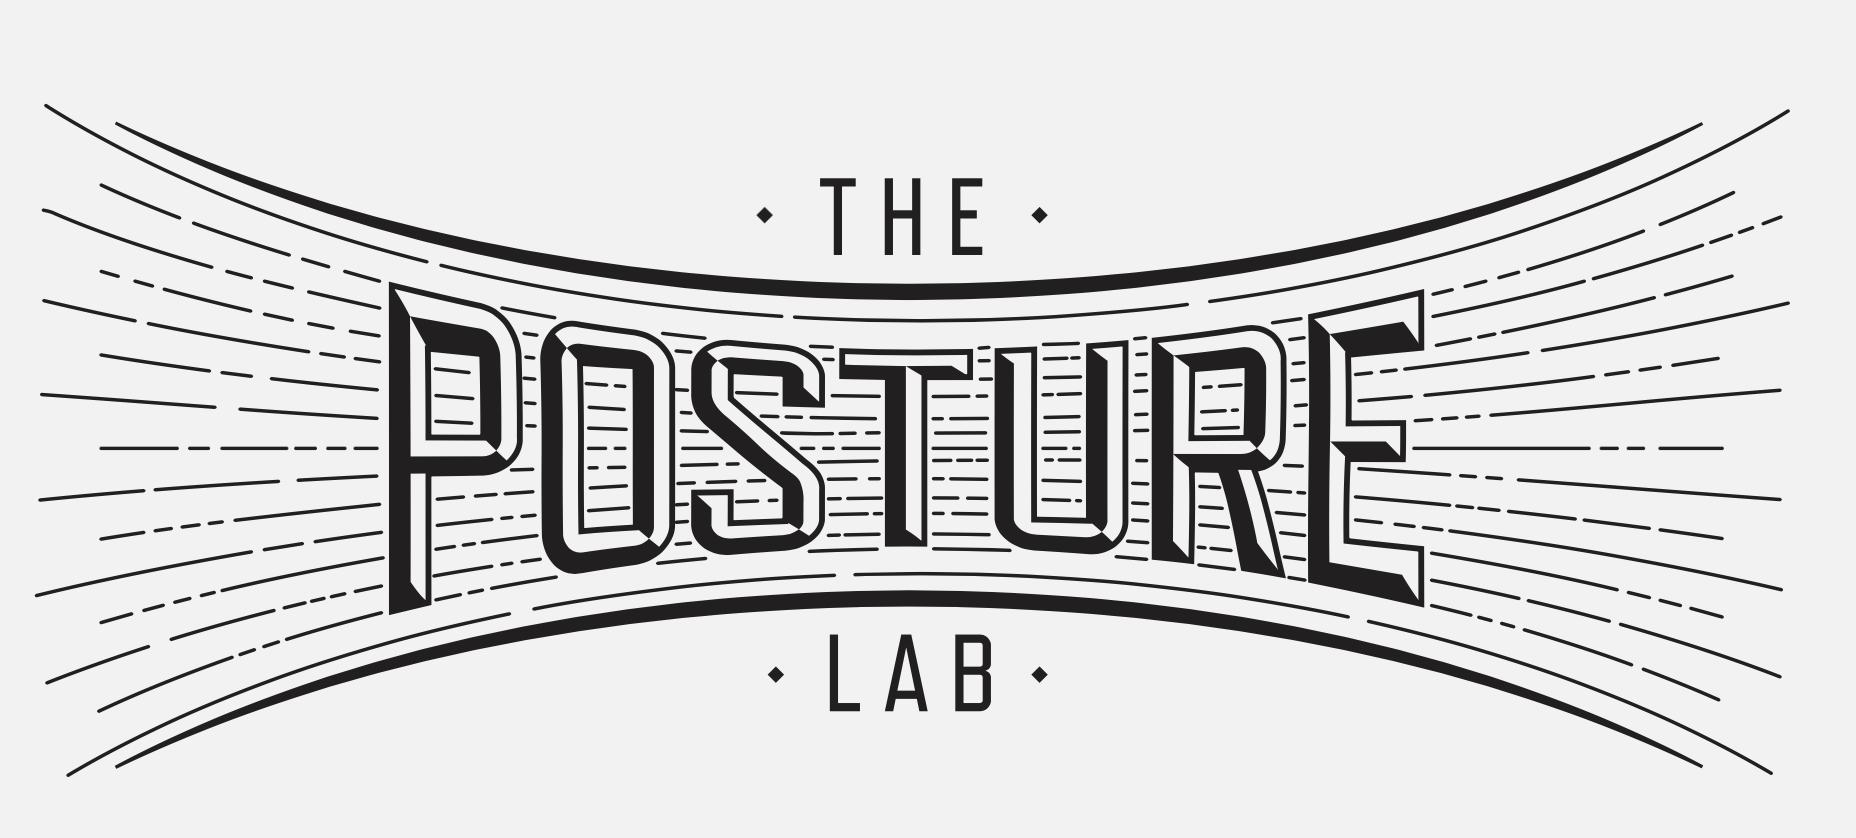 The Posture Lab